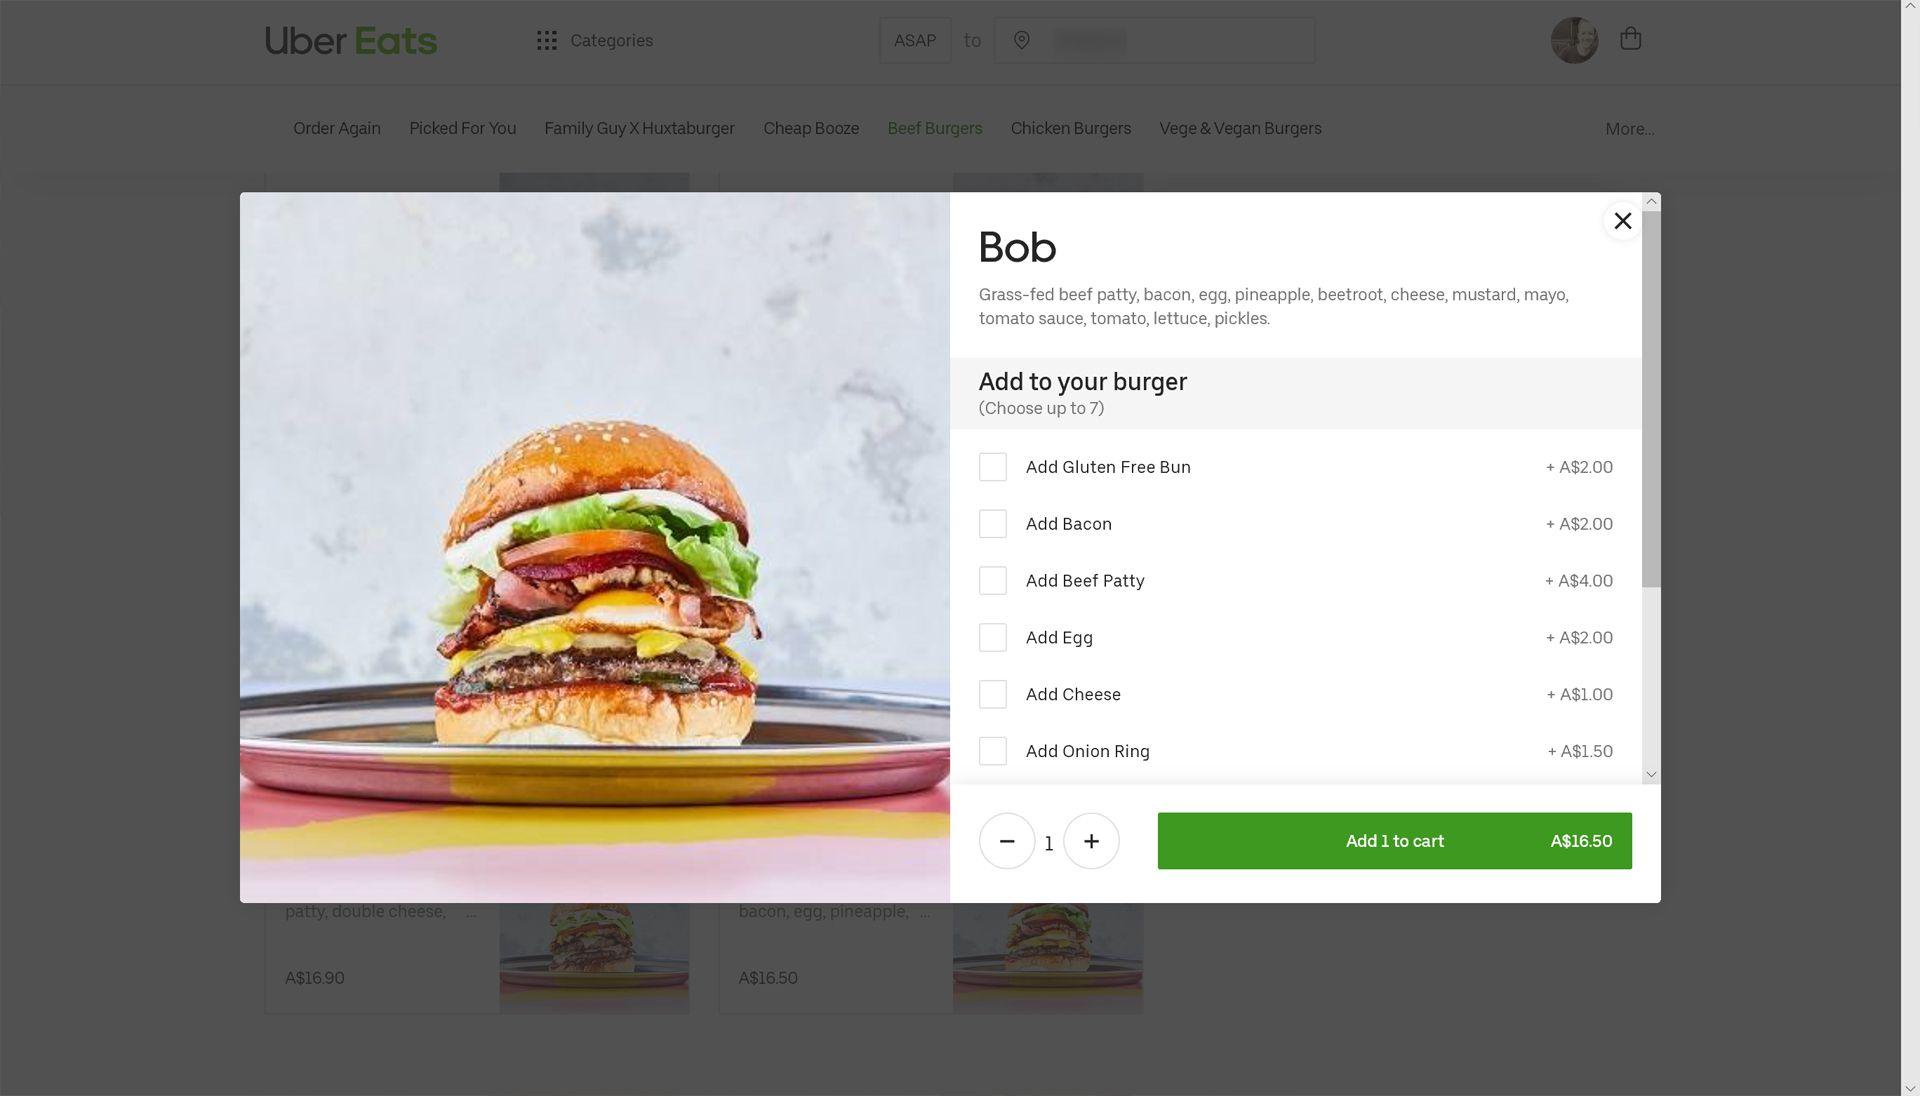 Ordering food on the Uber Eats website.